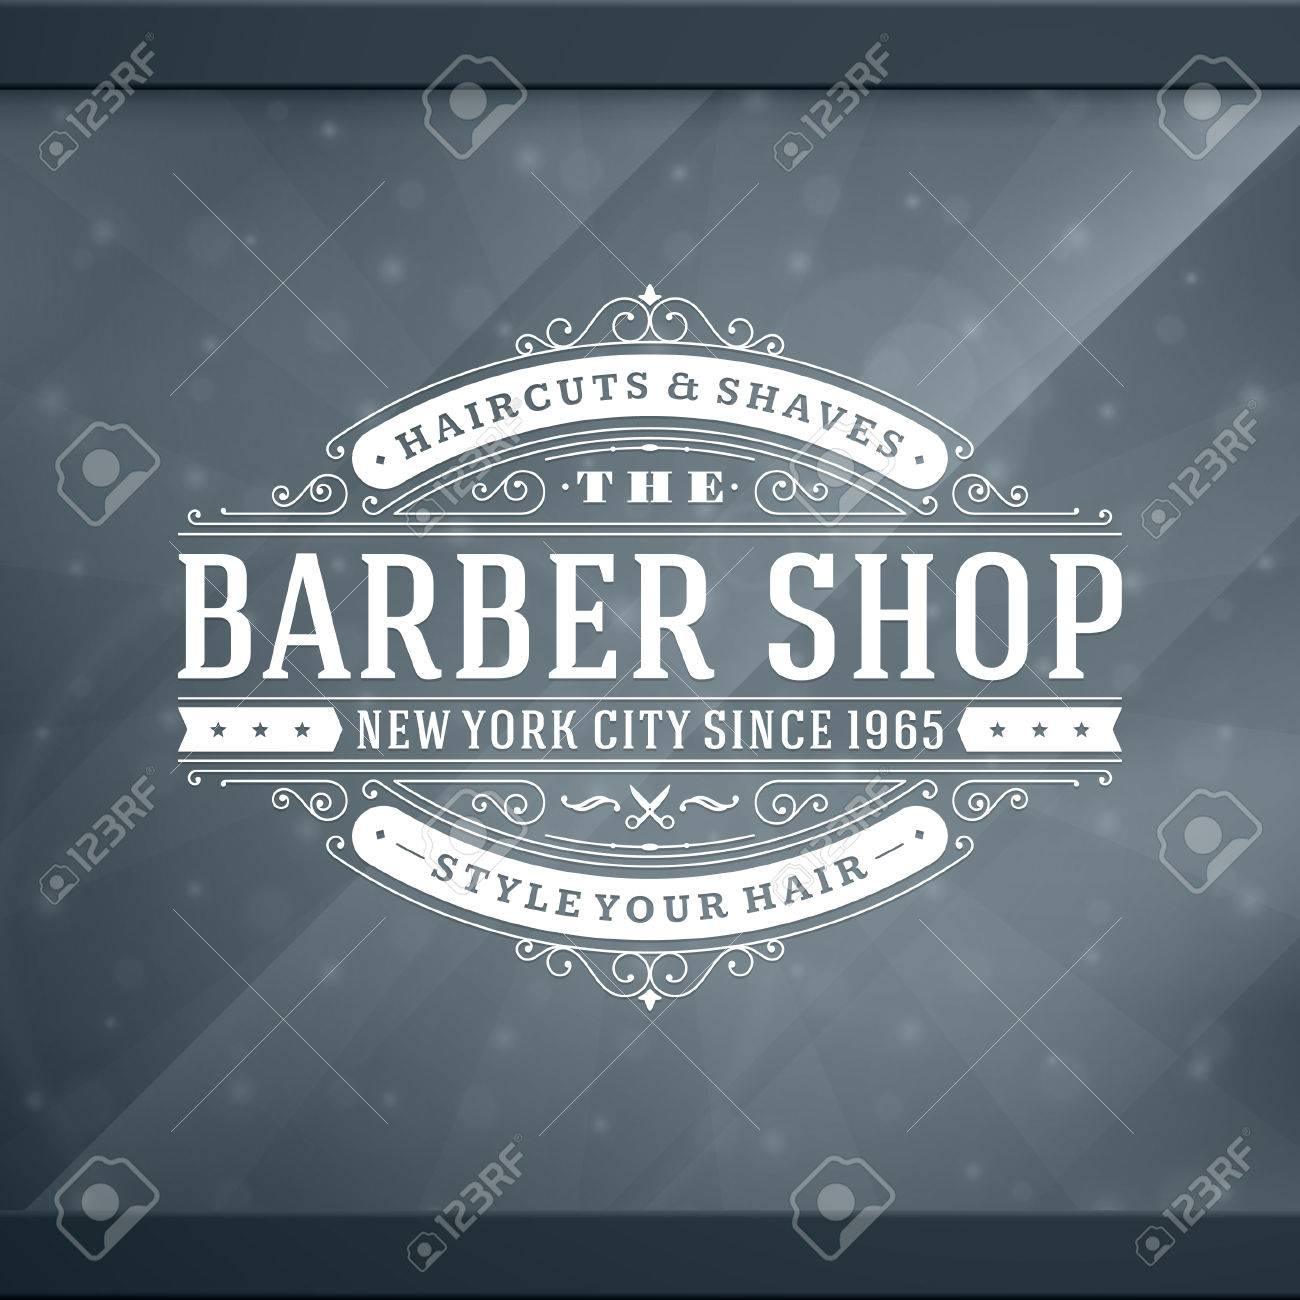 Barber shop vintage retro typographic design template Stock Vector - 26273515